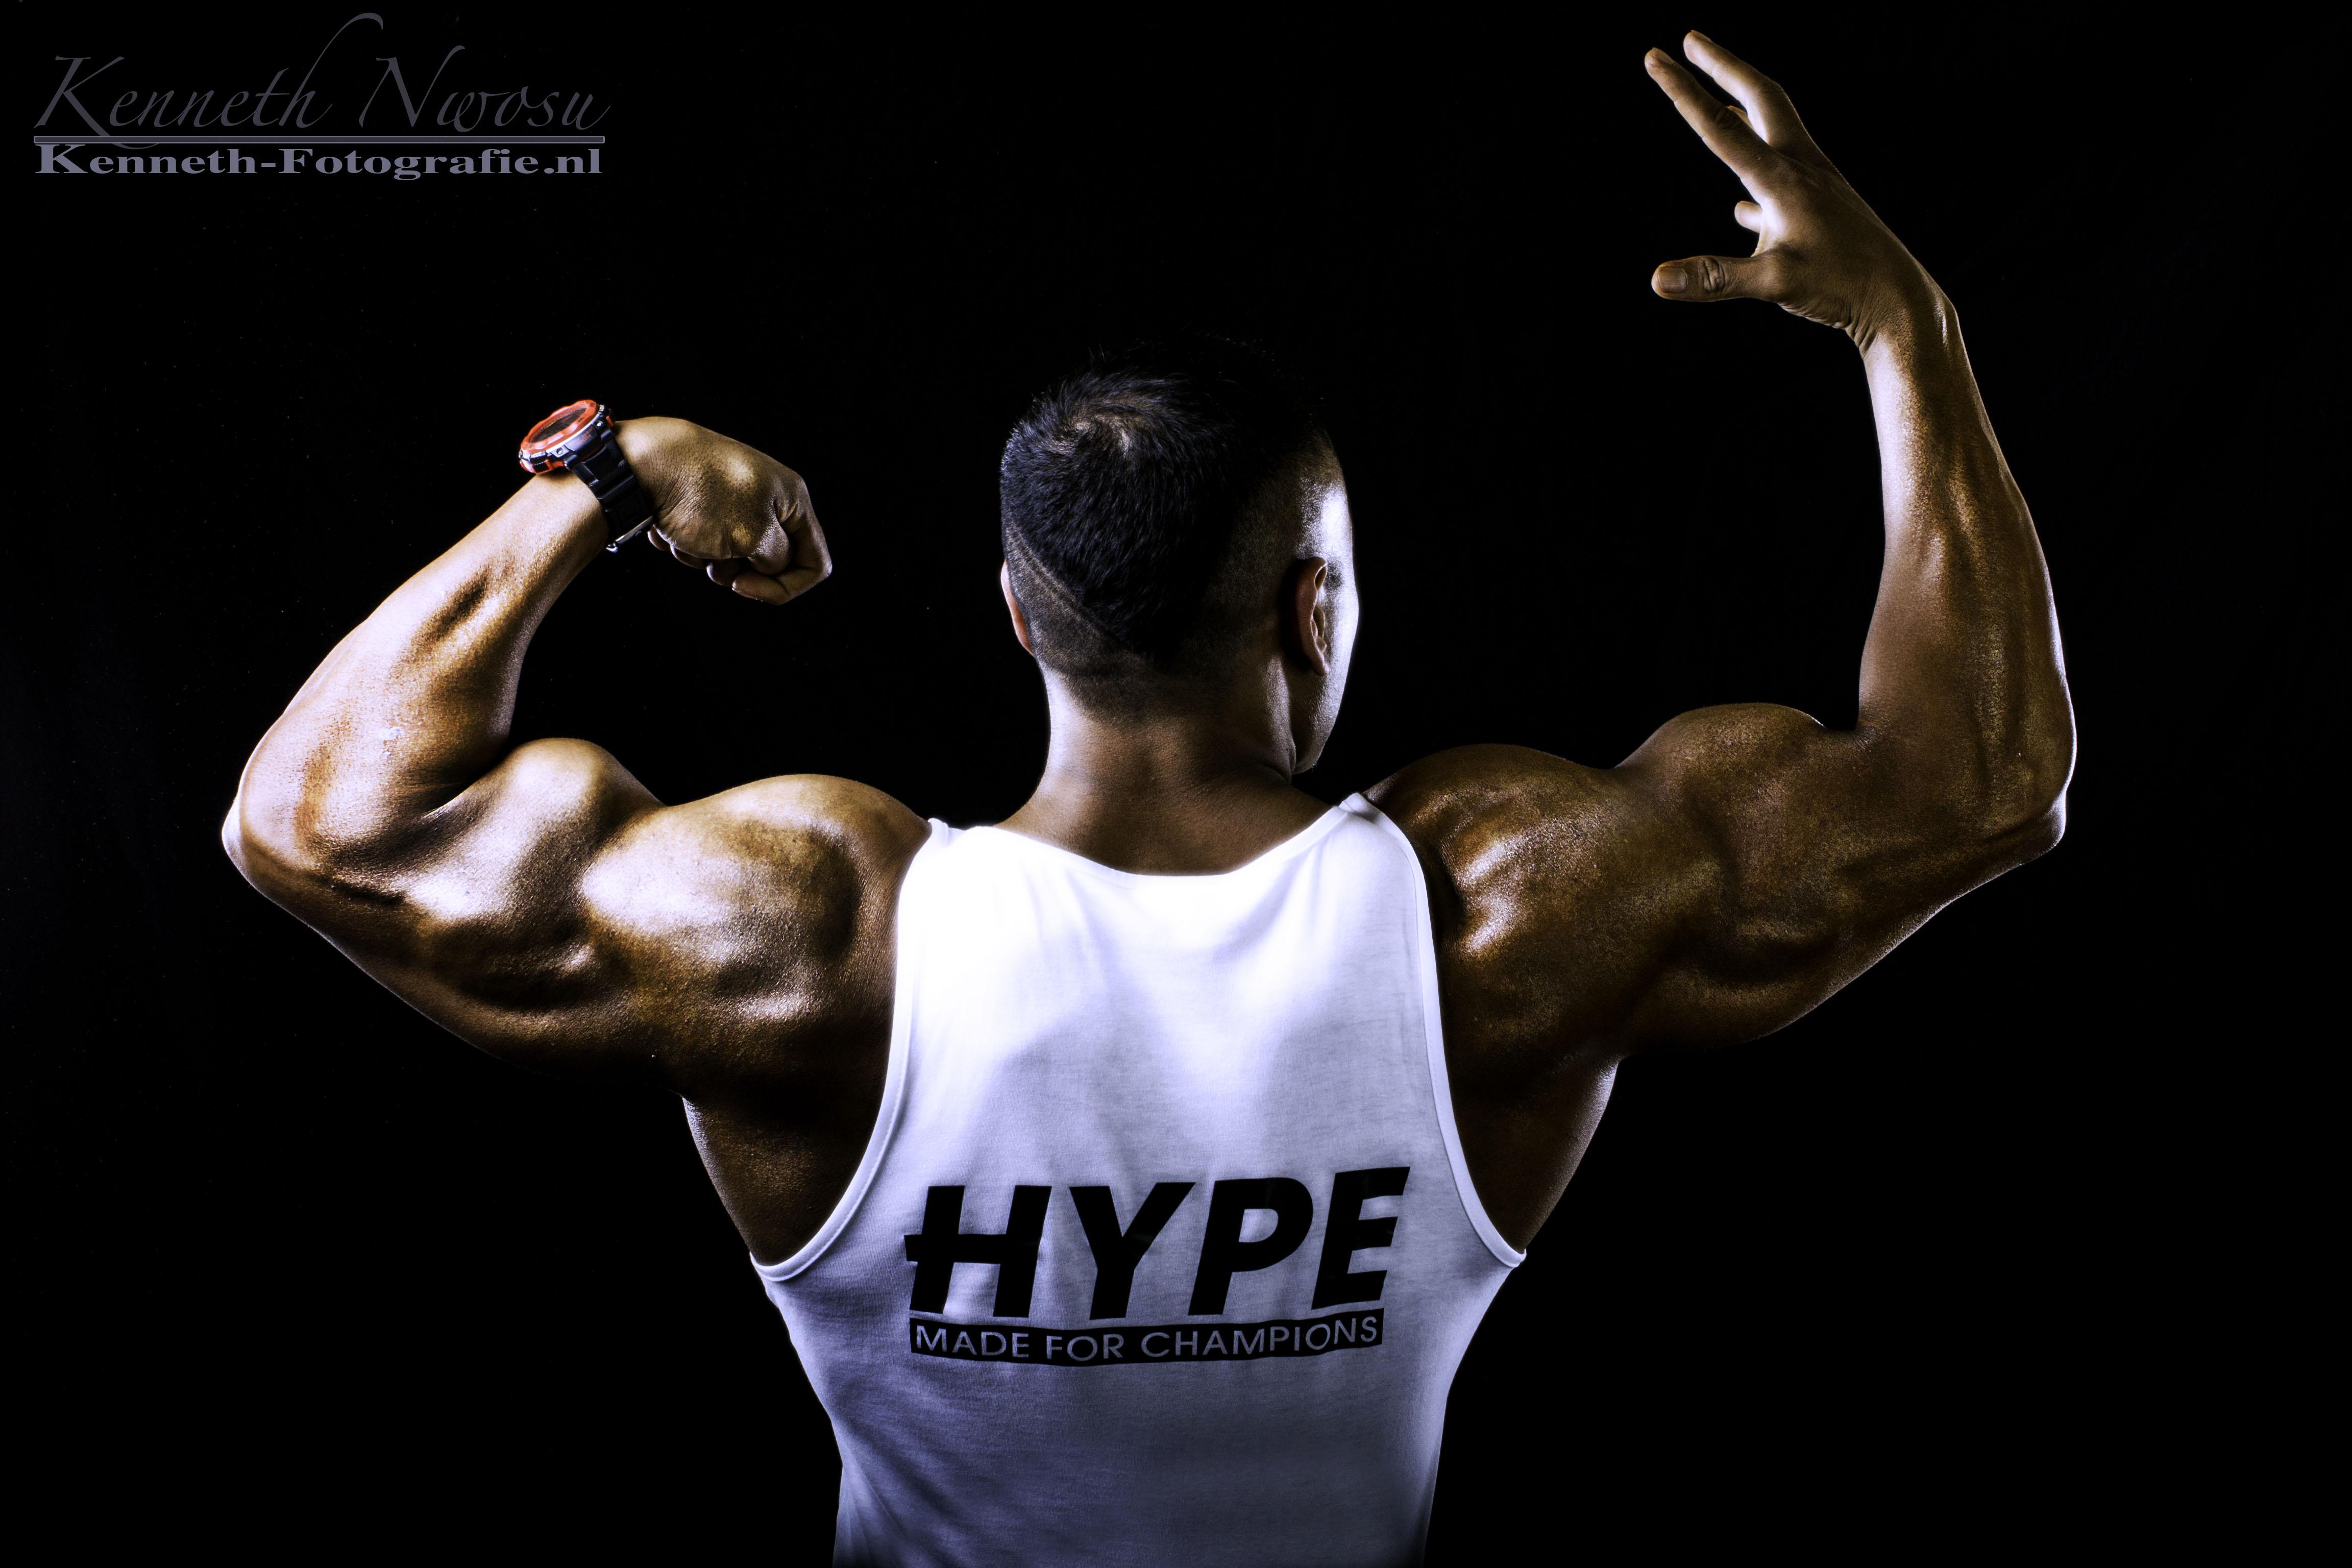 Team Hype Nutrition (fitness fotografie met Nabil Athman, Camil Saris)